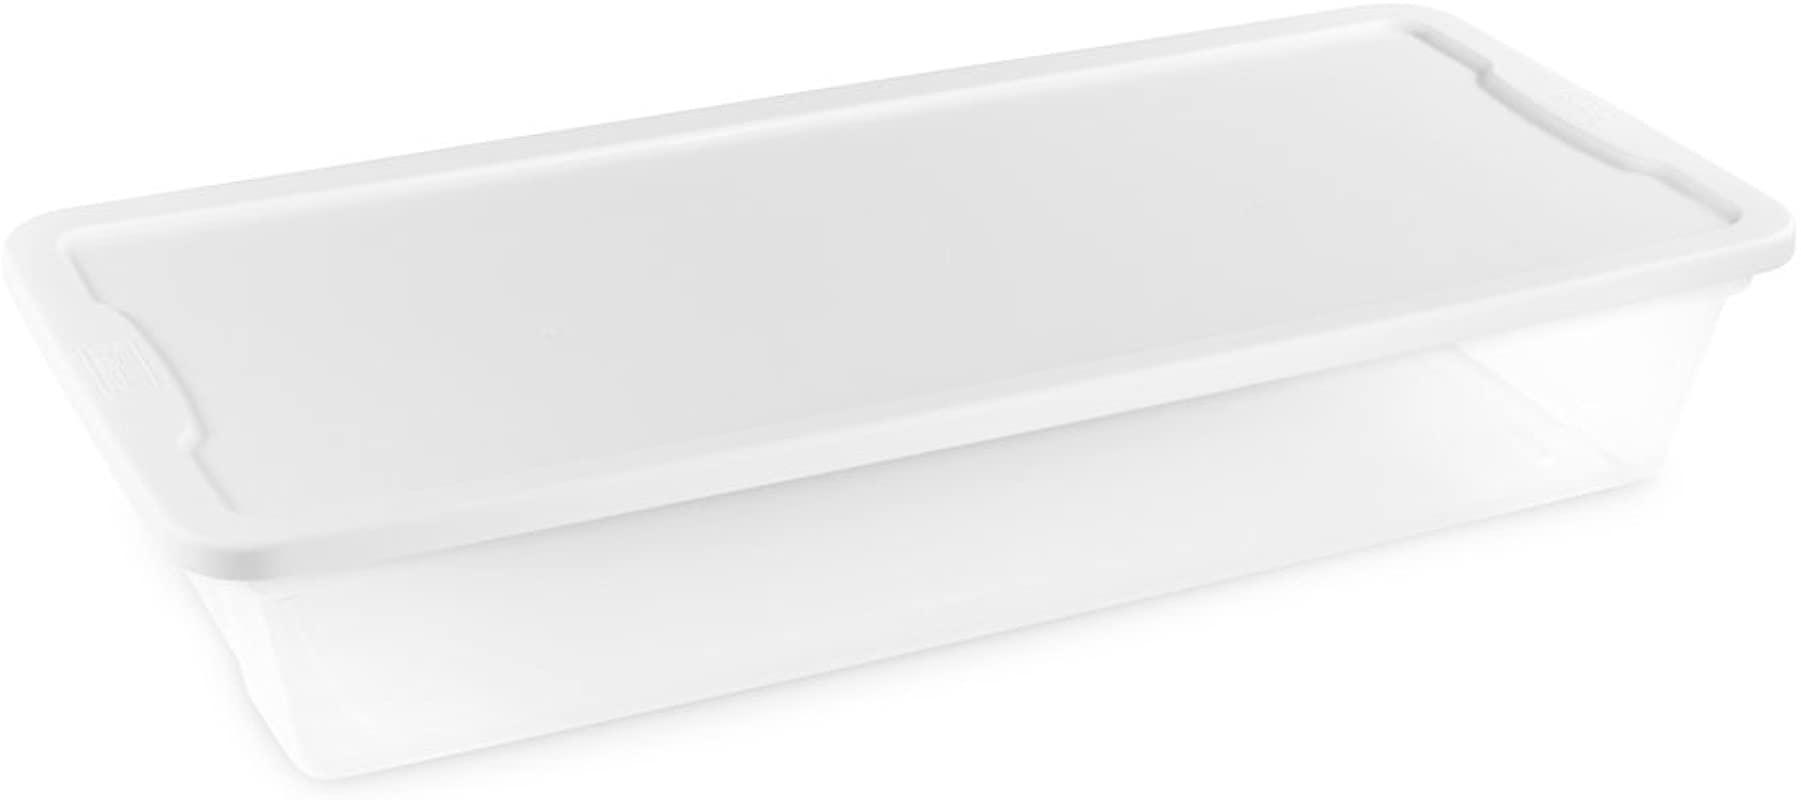 Homz Plastic Underbed Storage Snap Lock White Lids 41 Quart Clear Stackable 6 Pack